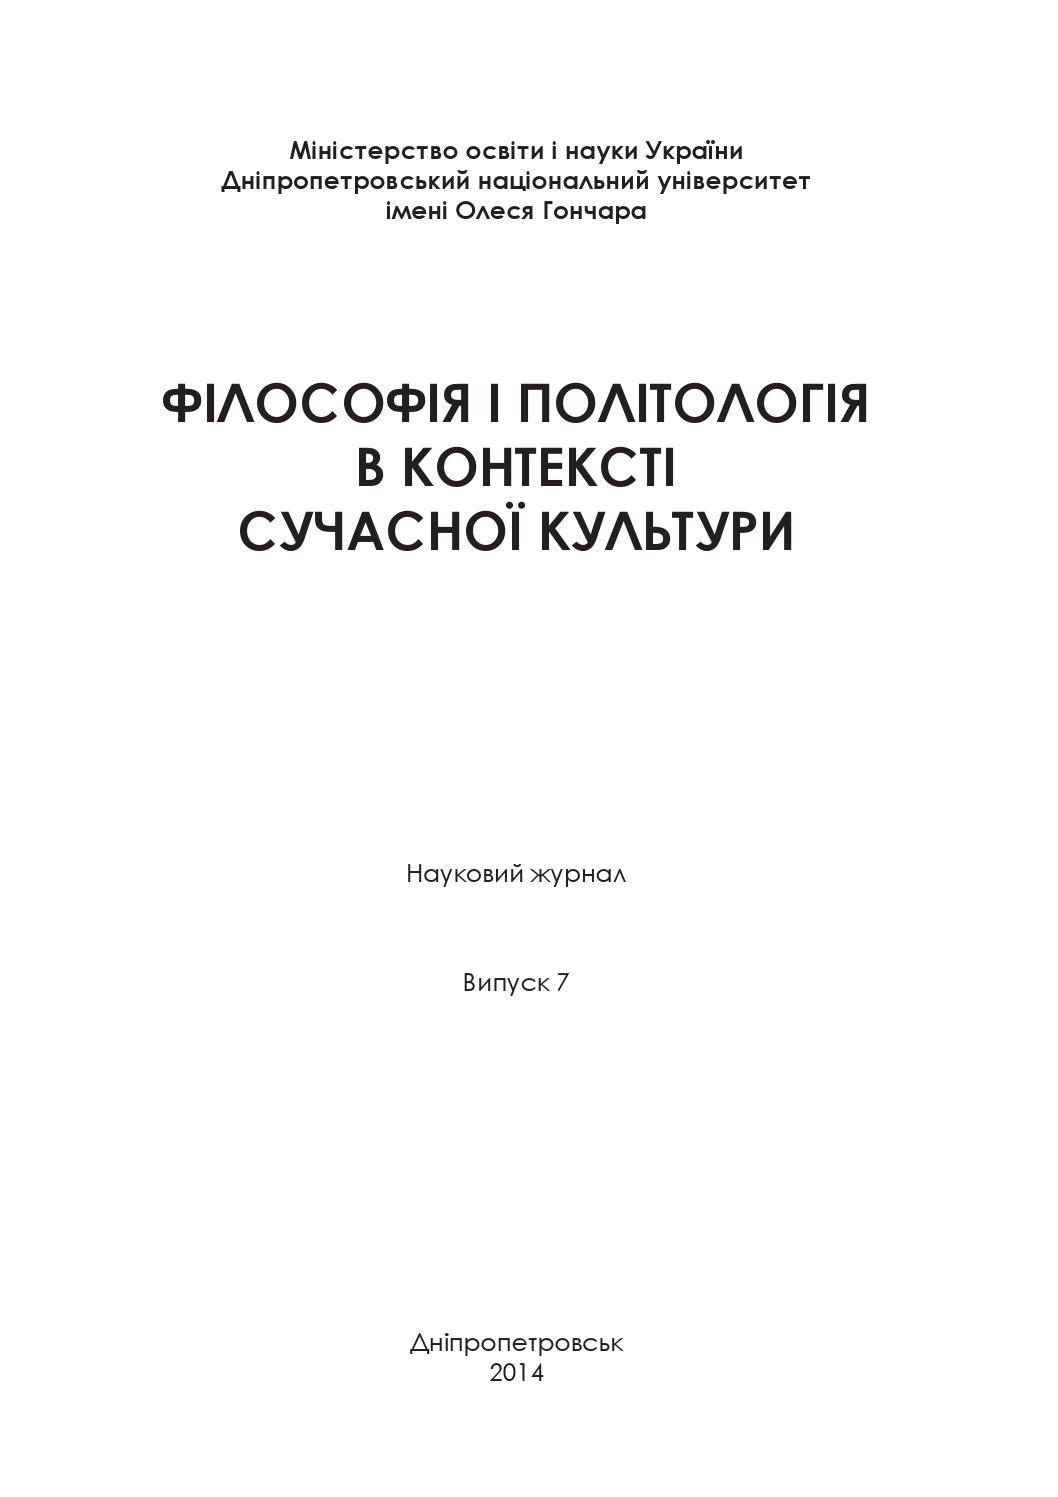 приказ мон рк 61 от 25.02.2014